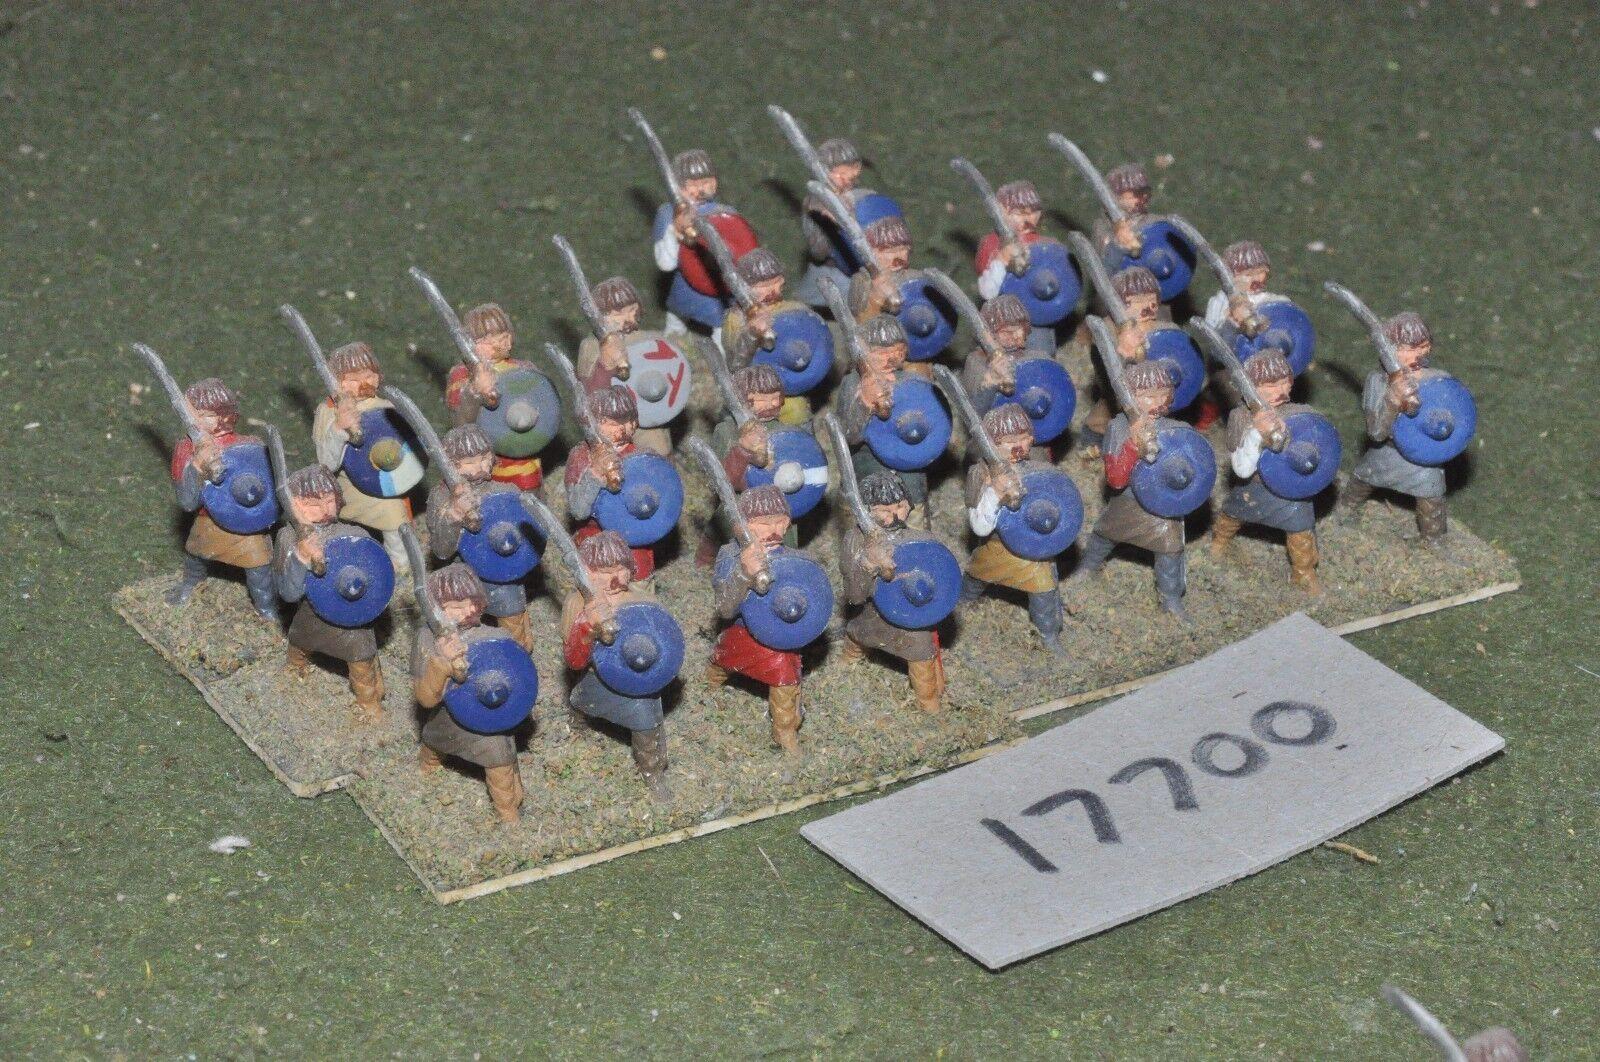 barato en línea 25mm época Romana bosque dacio-falxmen 26 higos-INF (17700) (17700) (17700)  descuento de bajo precio